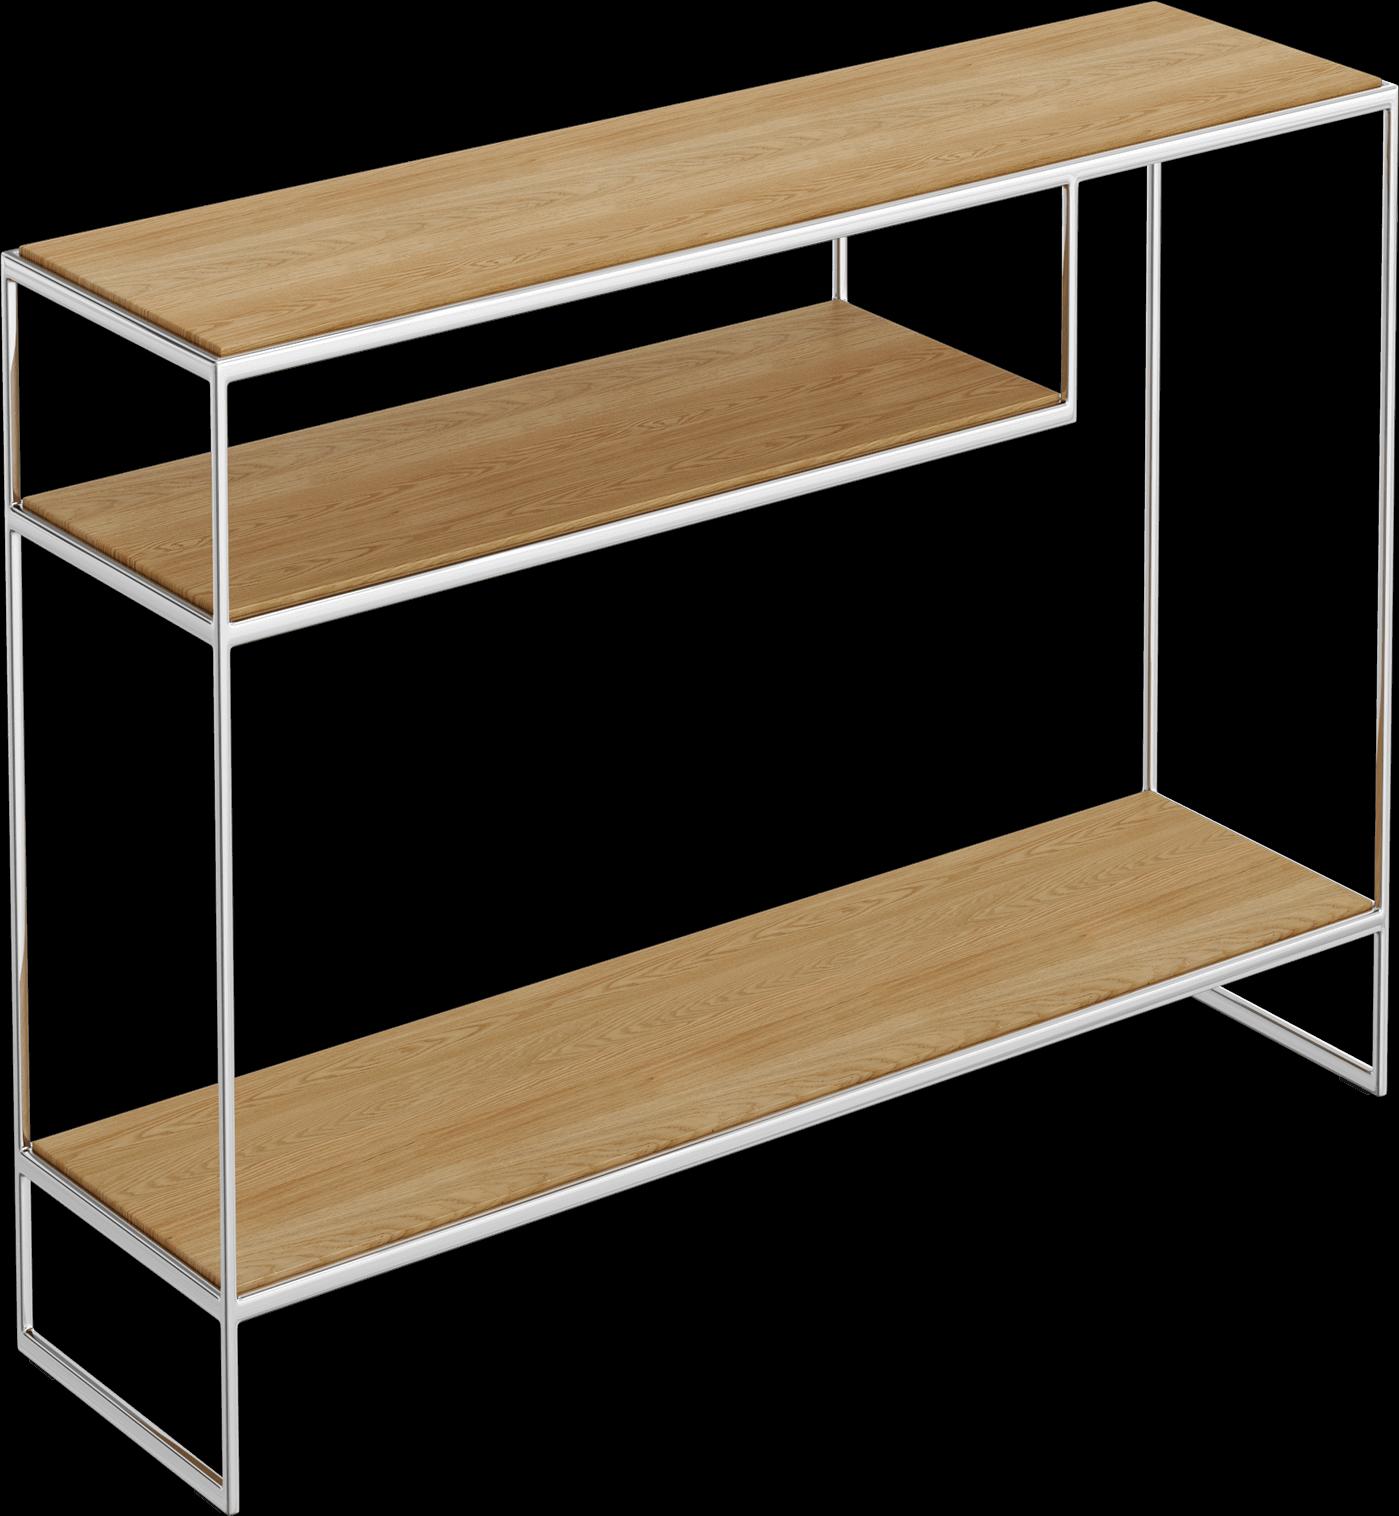 toscana regal toscana regale shop gallery m. Black Bedroom Furniture Sets. Home Design Ideas